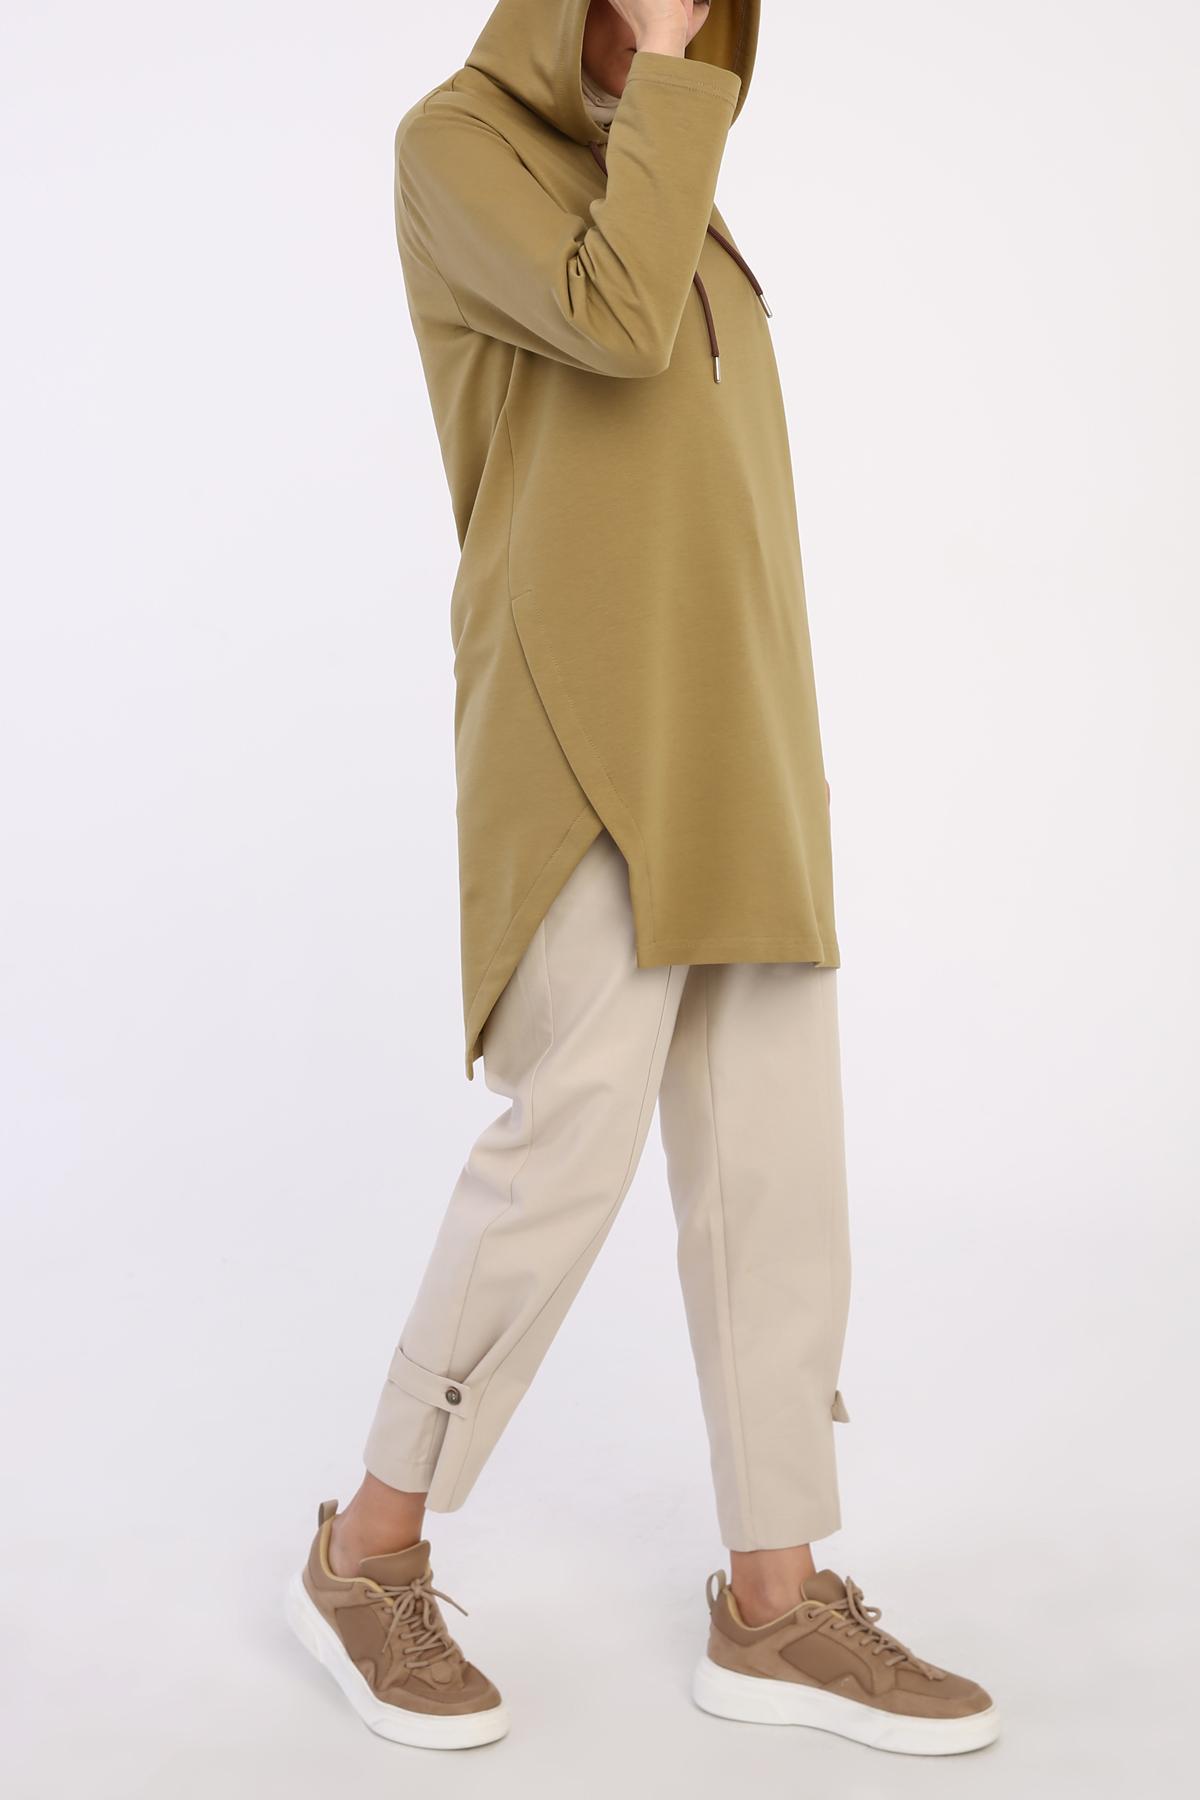 Asymmetric Hem Comfy Hooded Tunic